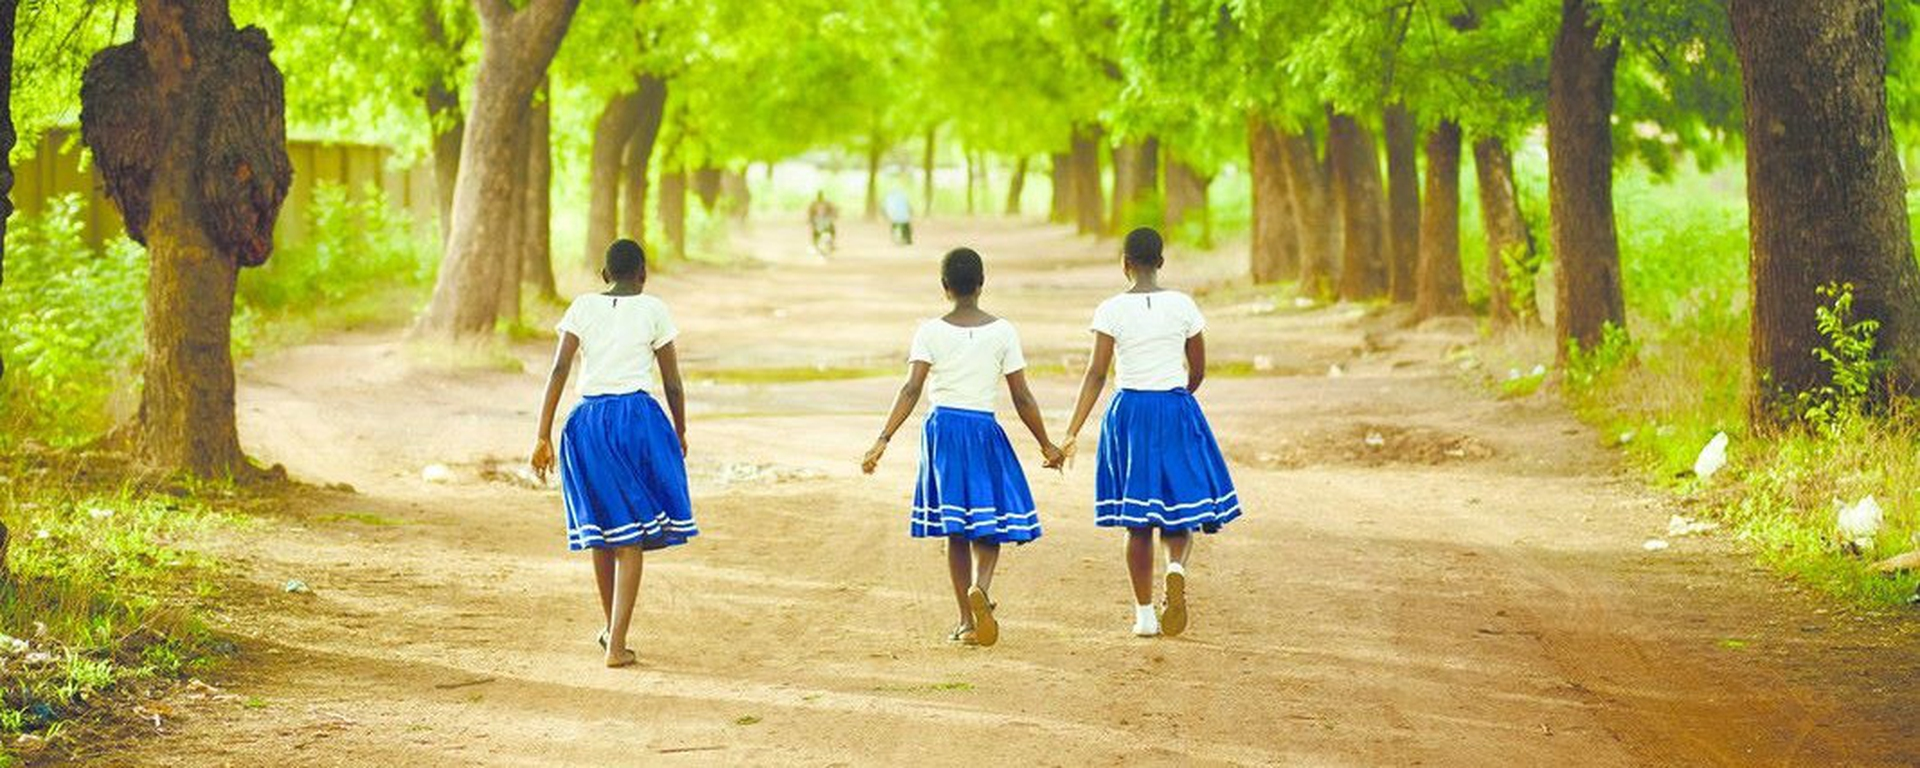 Mastercard Foundation - Social Innovation and Entrepreneurship Fund - Cameroon Movemeback African initiative cover image